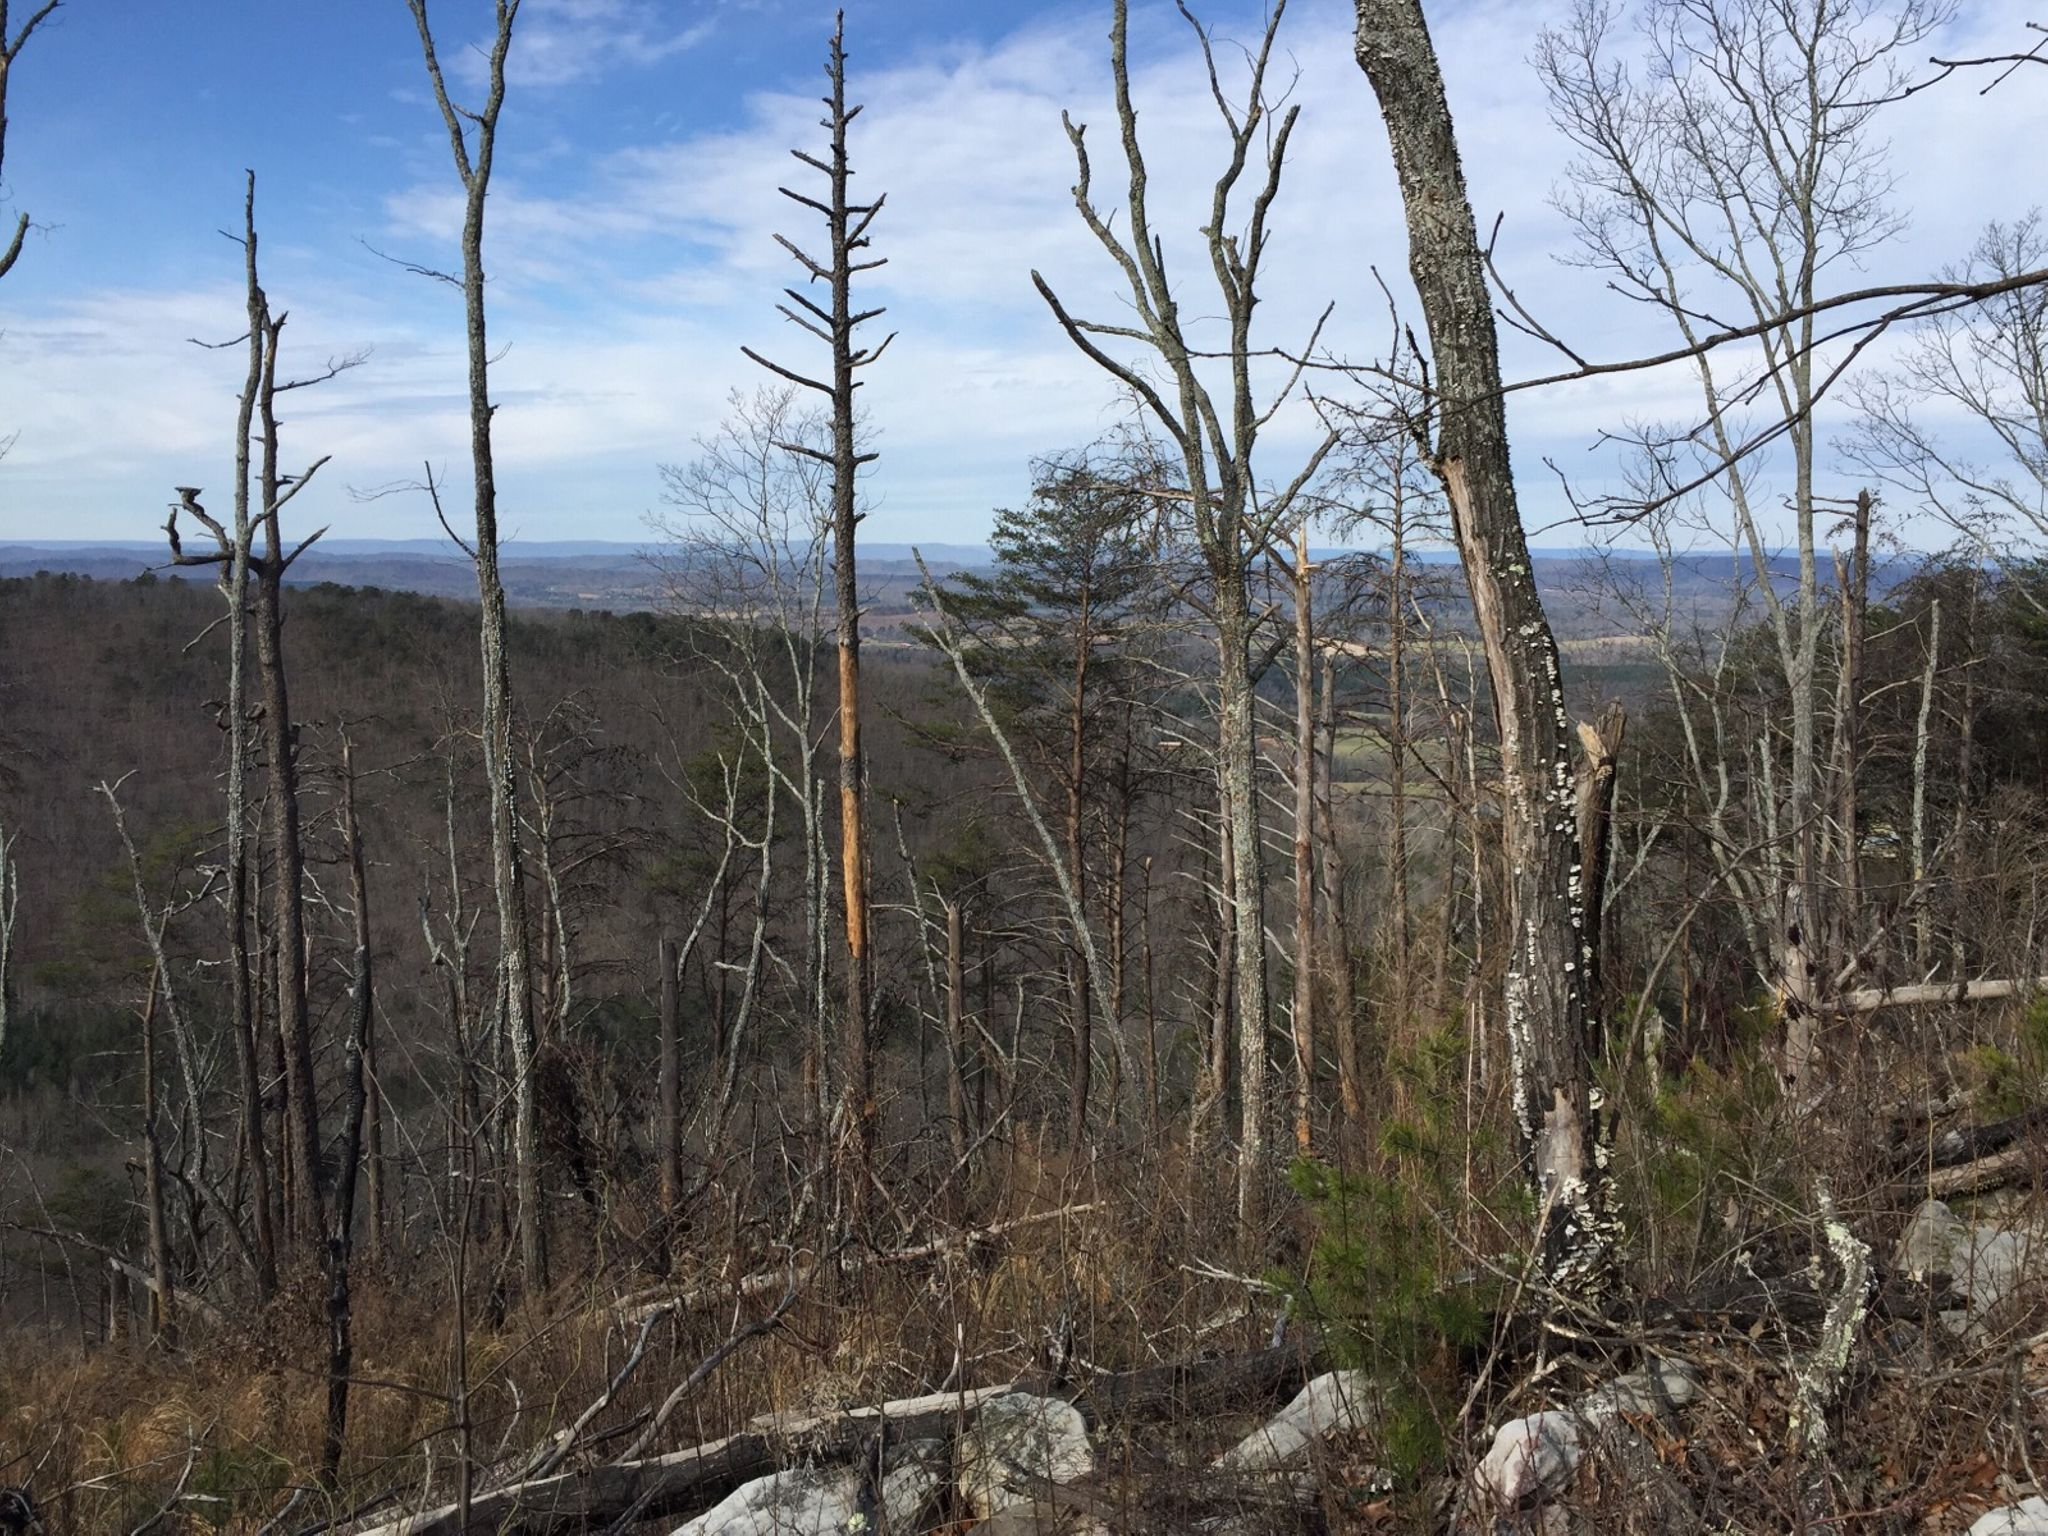 Blasted trees near Mill Creek Mountain.